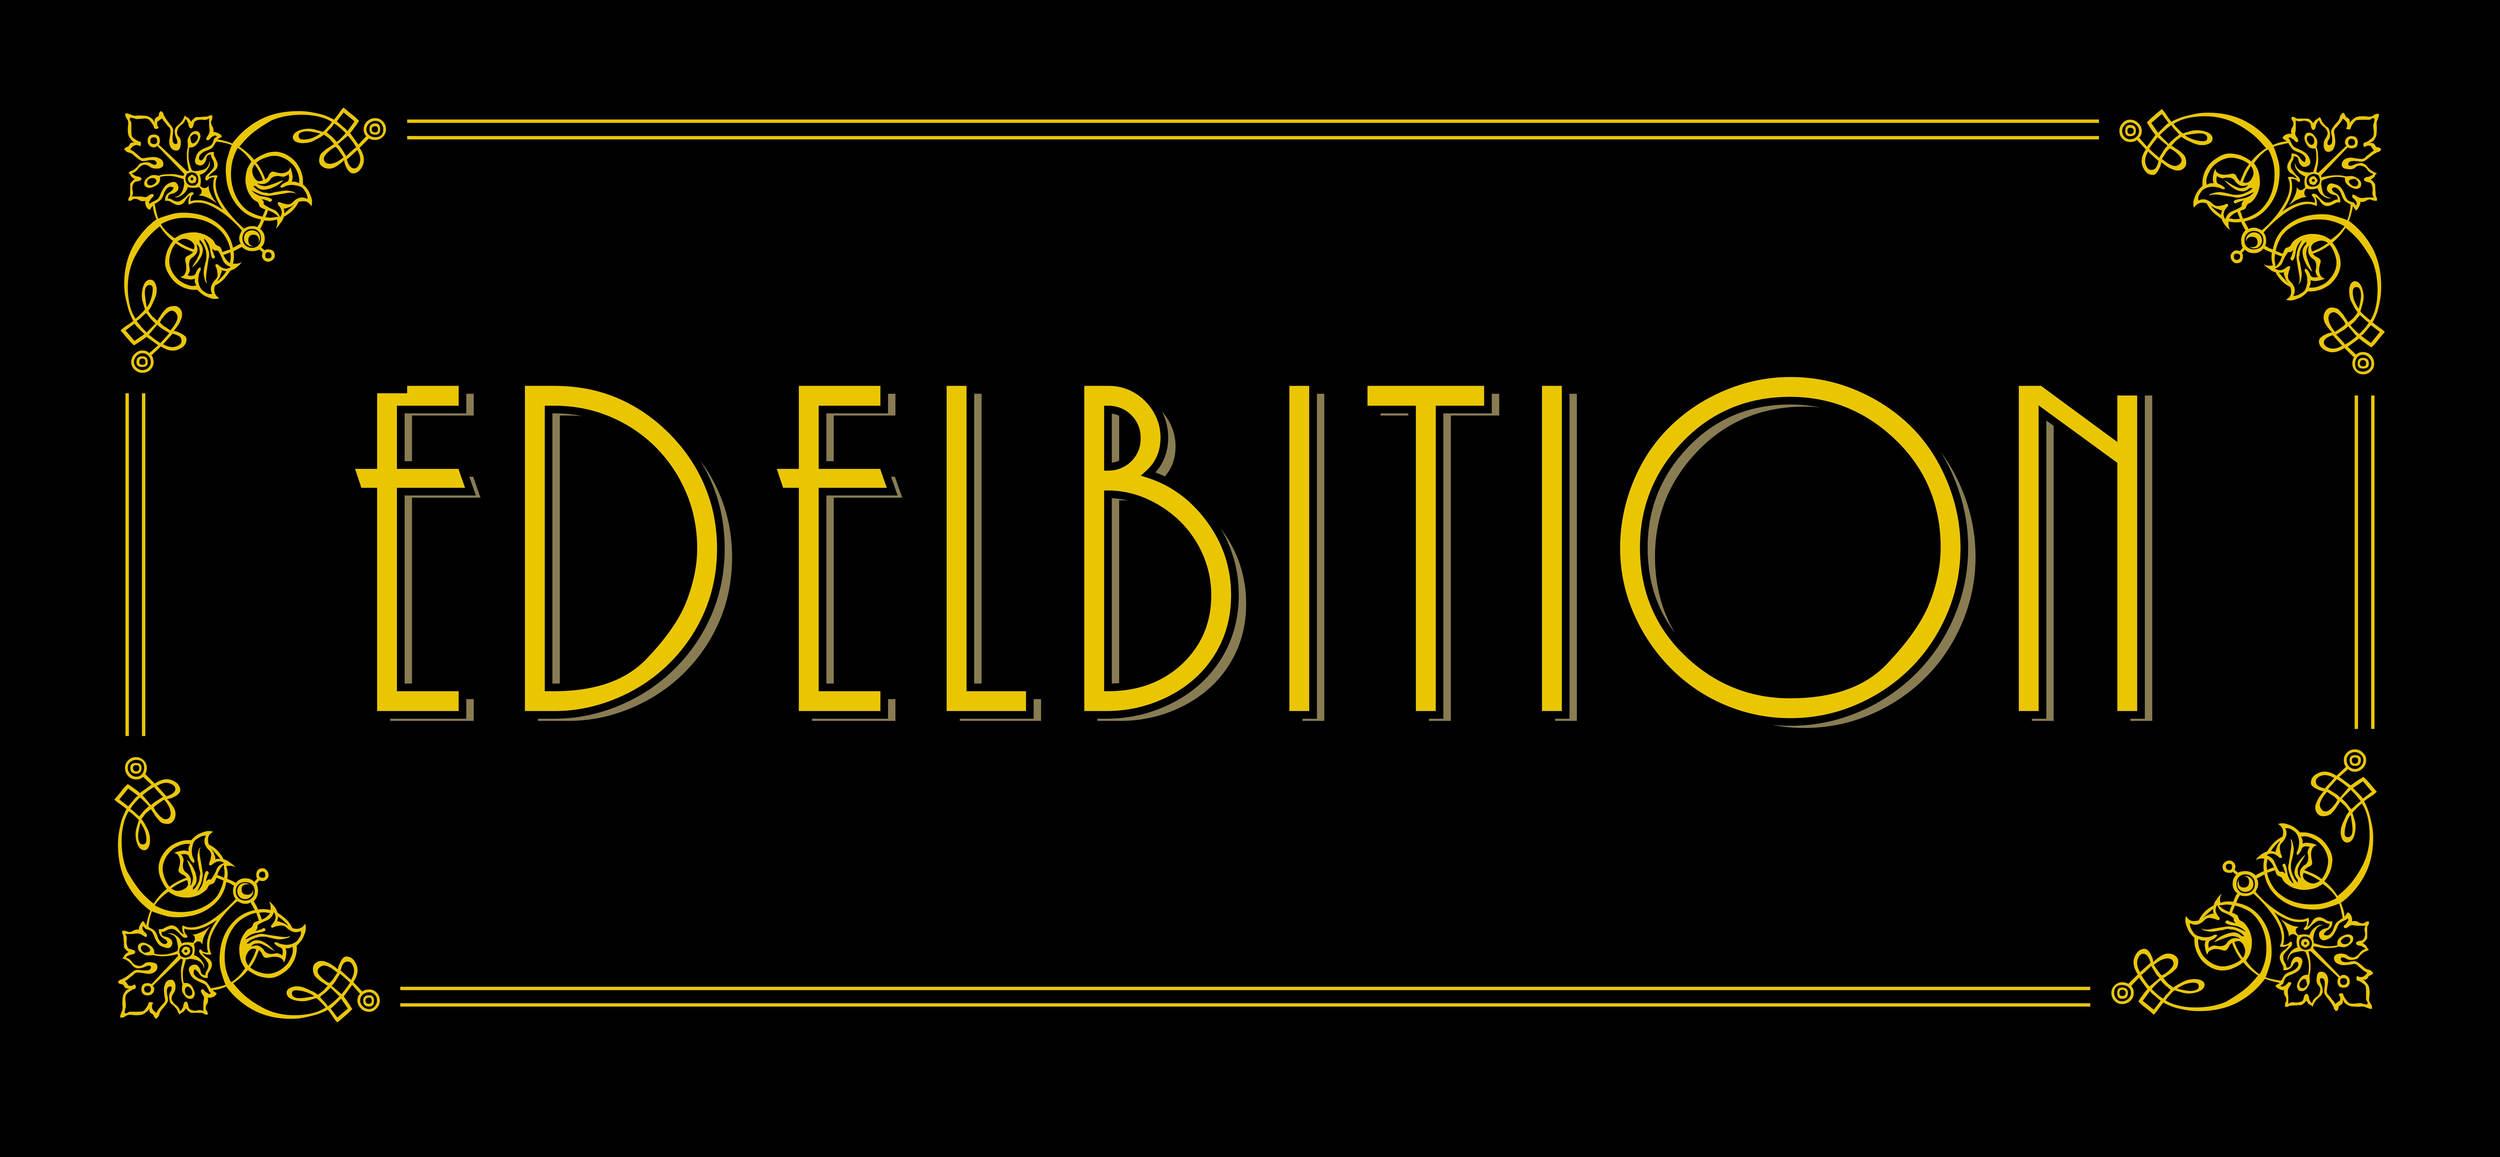 edelbition logo.jpg